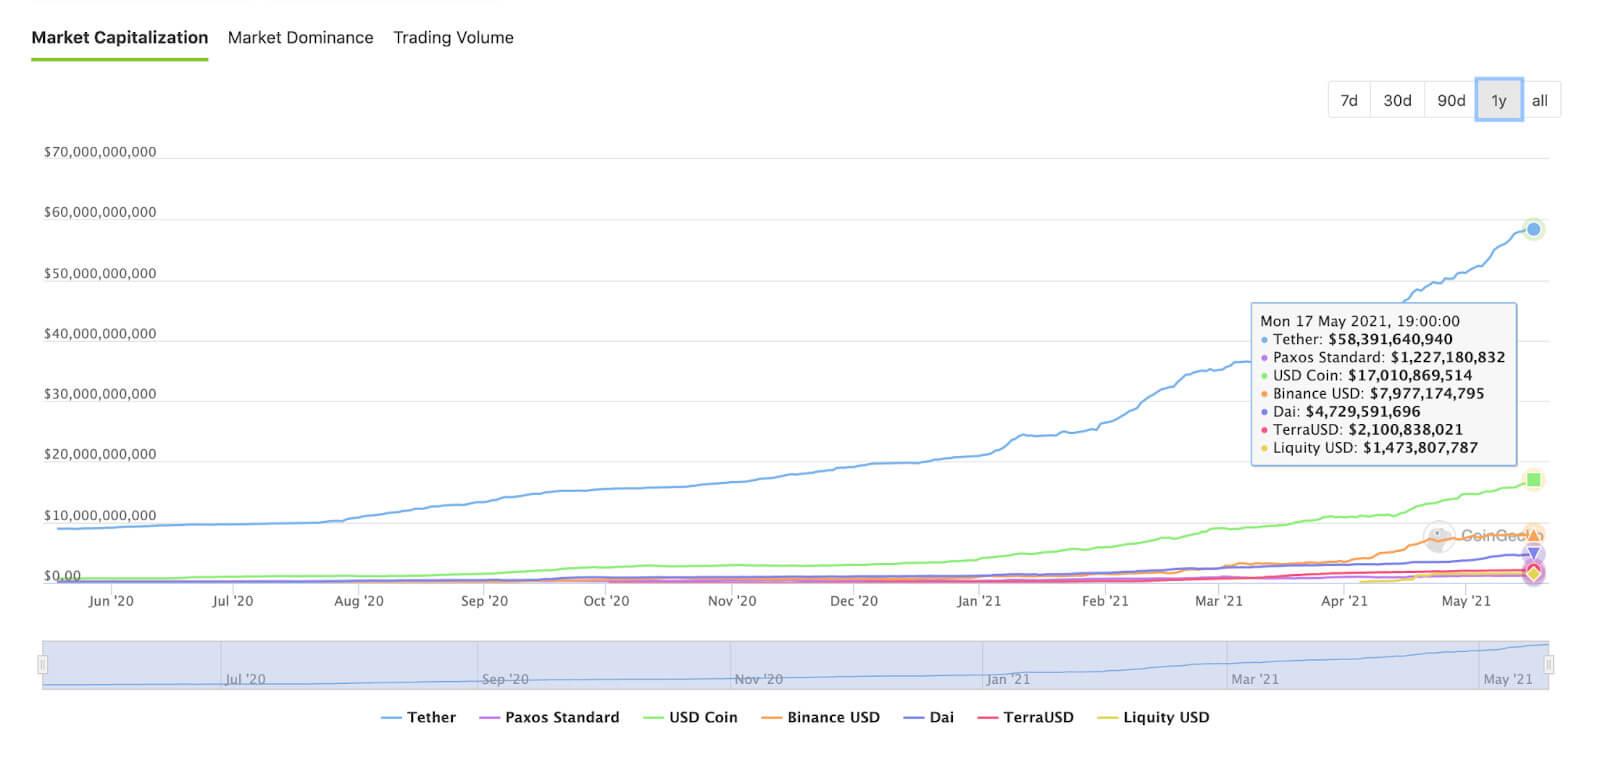 Major Stablecoins by Marketcap (Source: Coingecko)